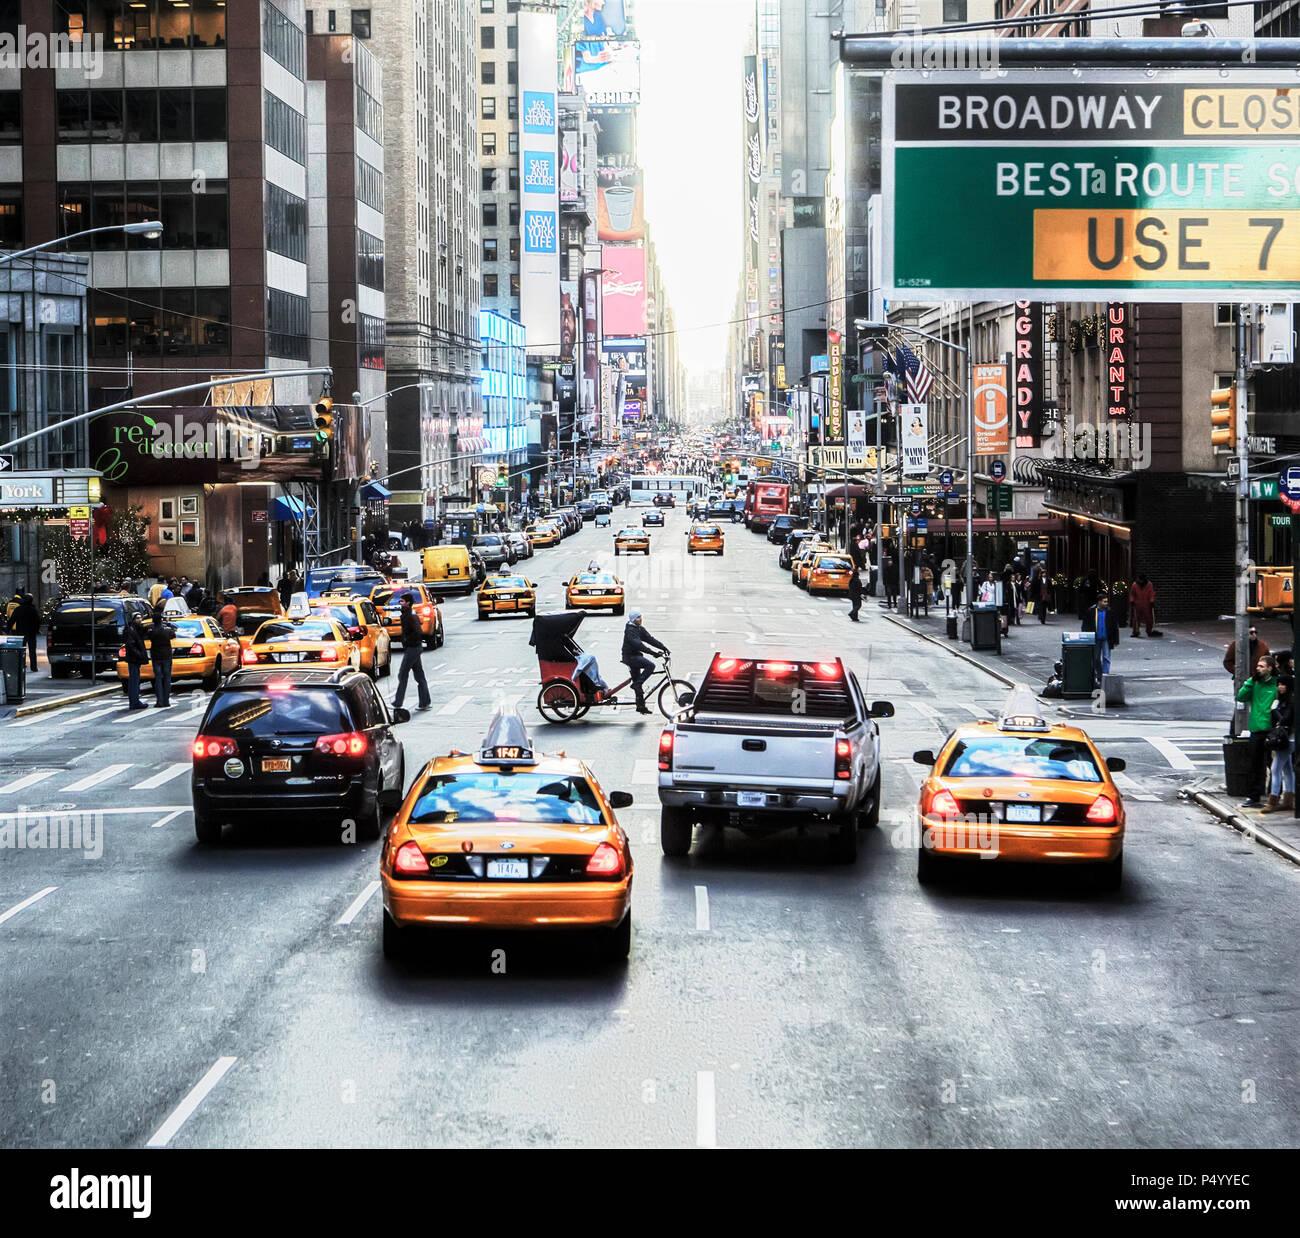 Street in New York, Manhattan. - Stock Image